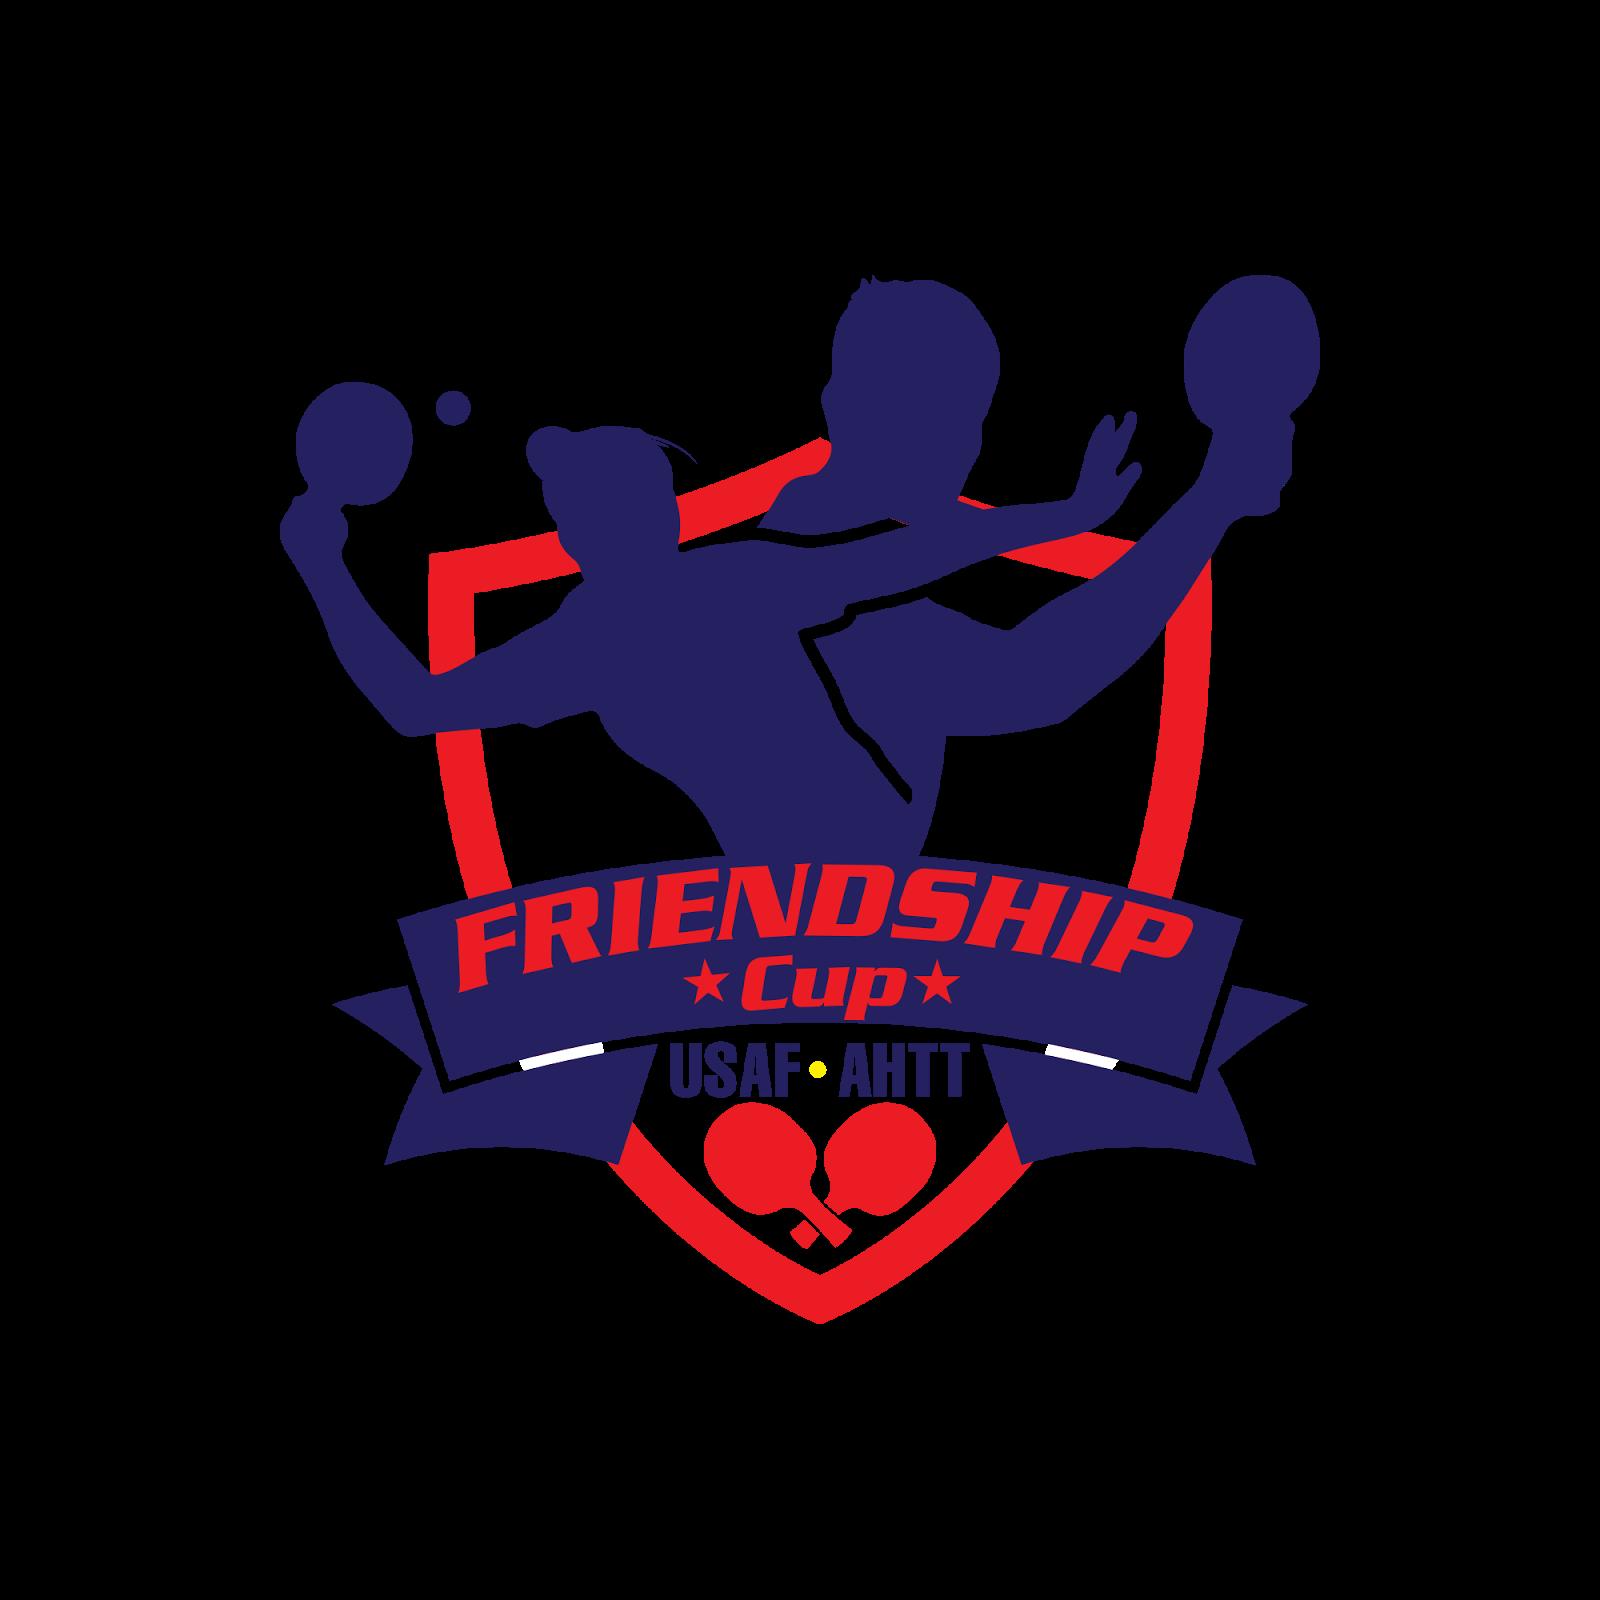 Haiti tennis de table friendship cup 2017 - Friendship tennis de table ...